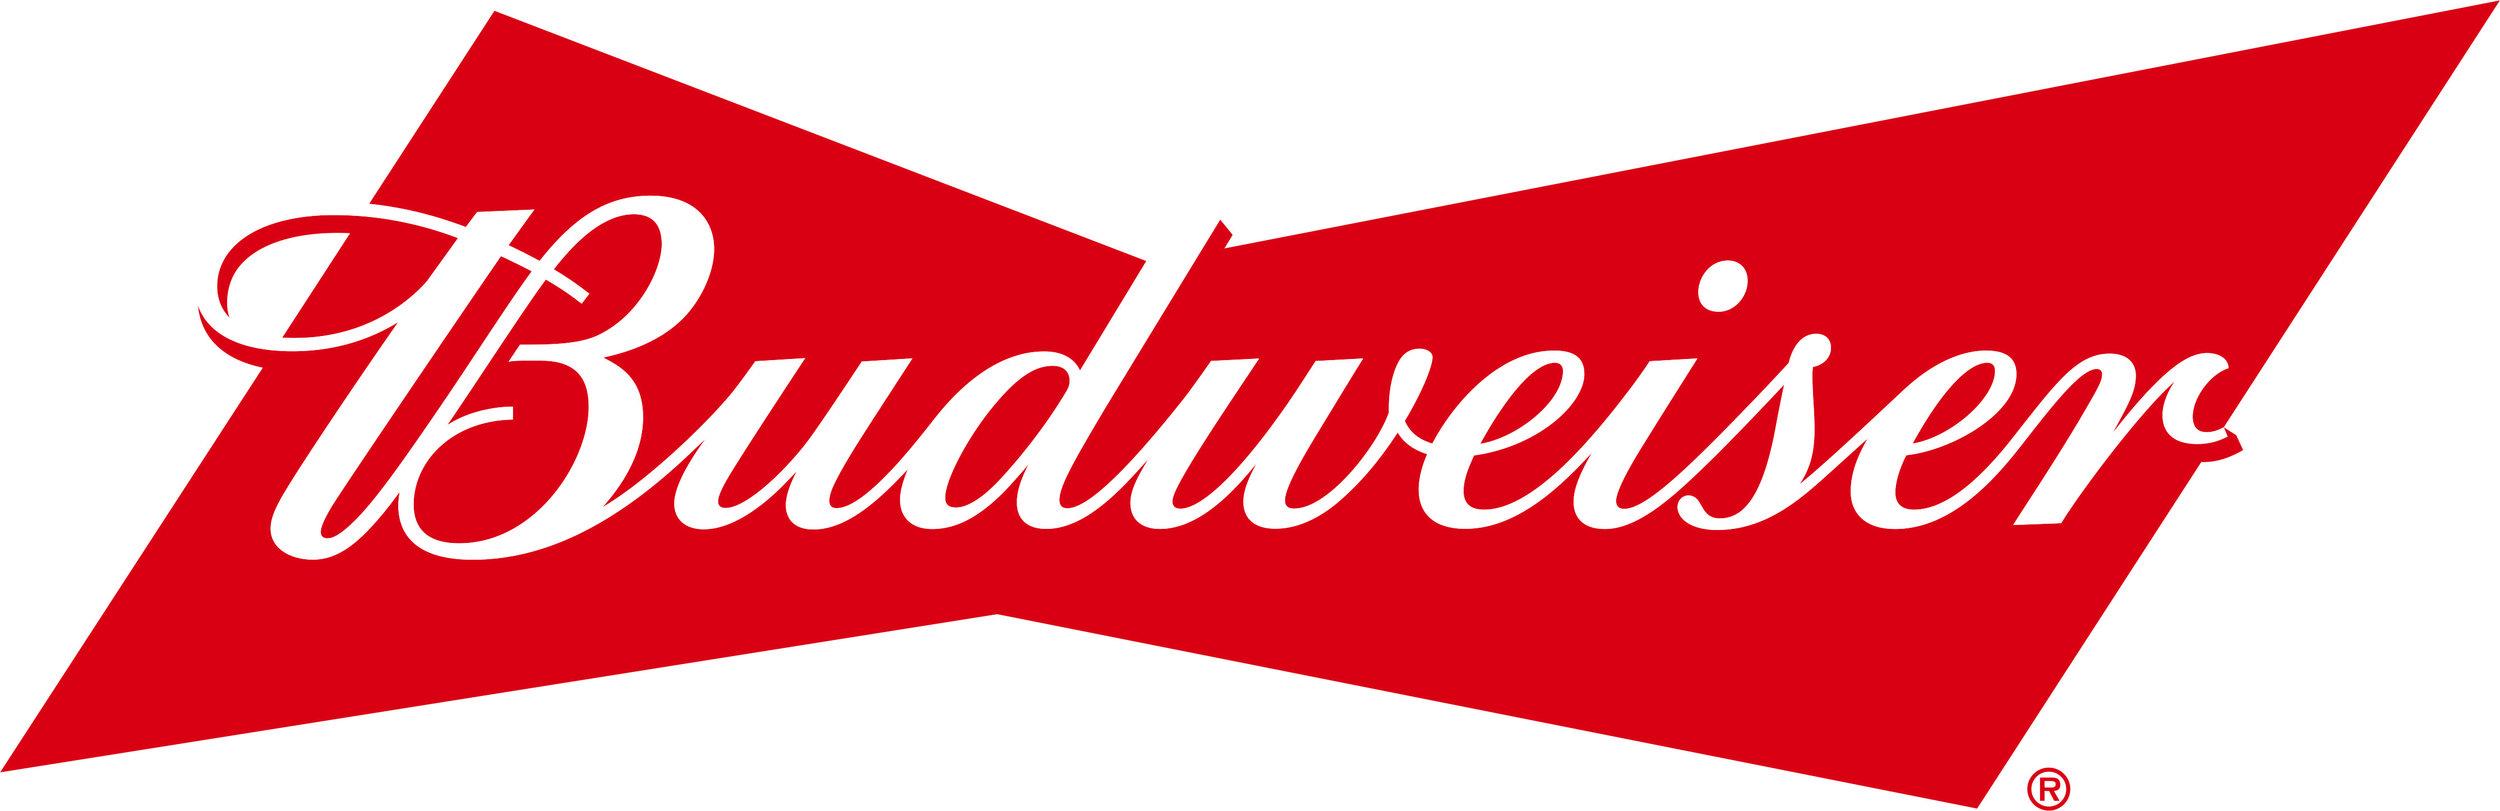 New-Budweiser-Logo-4-29-16.jpg